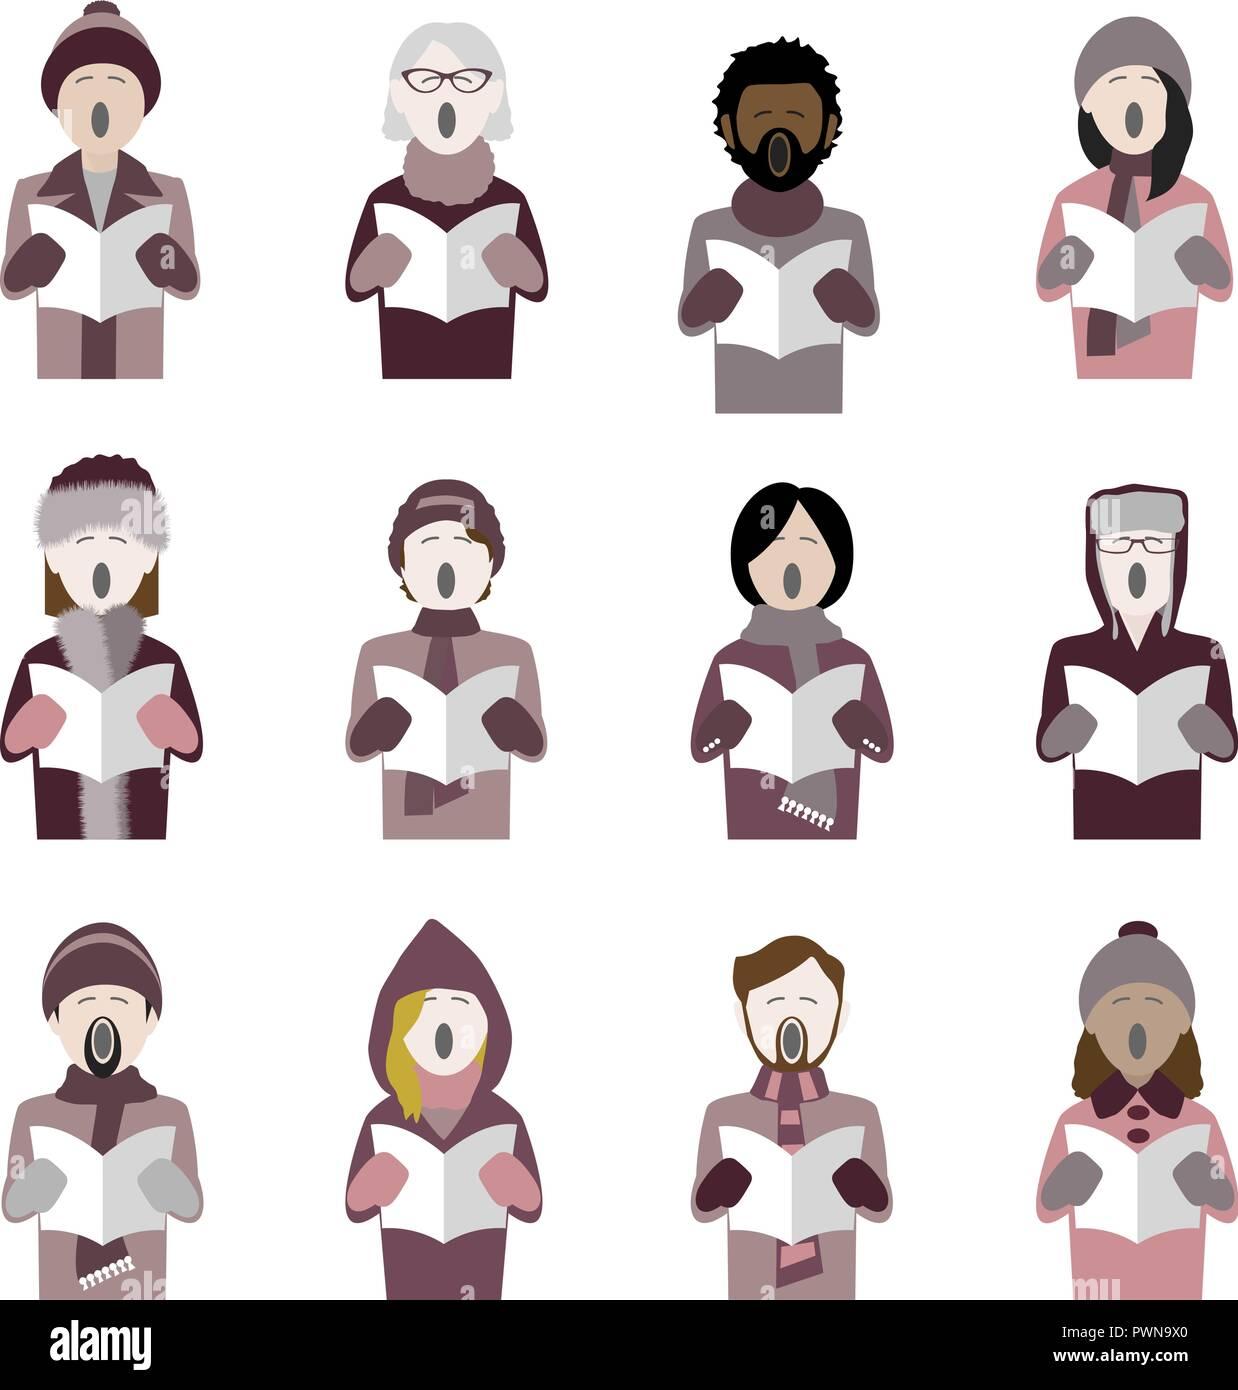 set of twelve icons of multiethnic adult christmas carol singers - Stock Vector